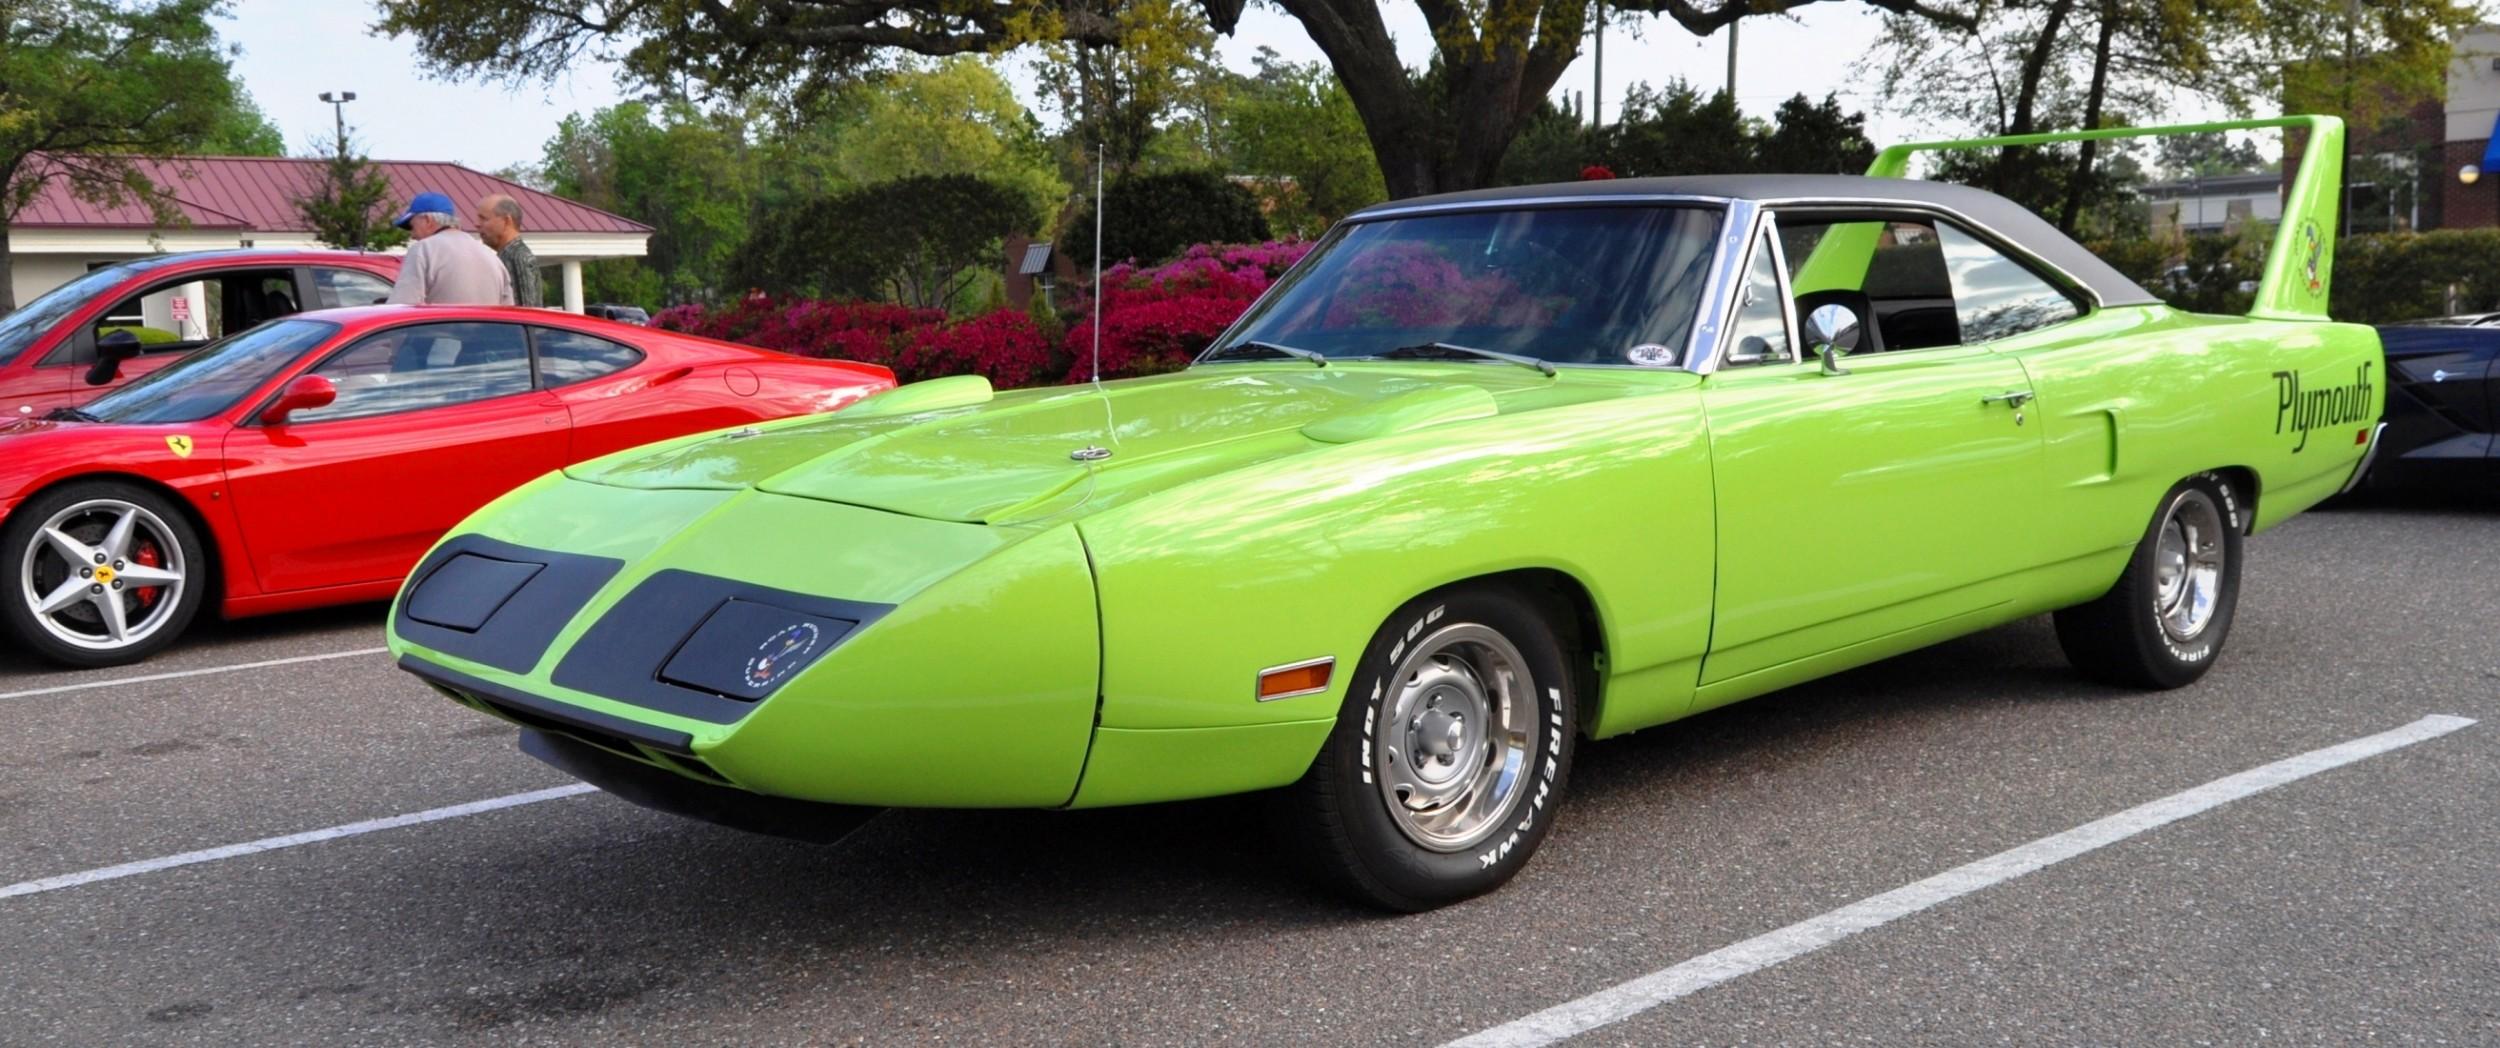 1970 Plymouth Road Runner Superbird Car